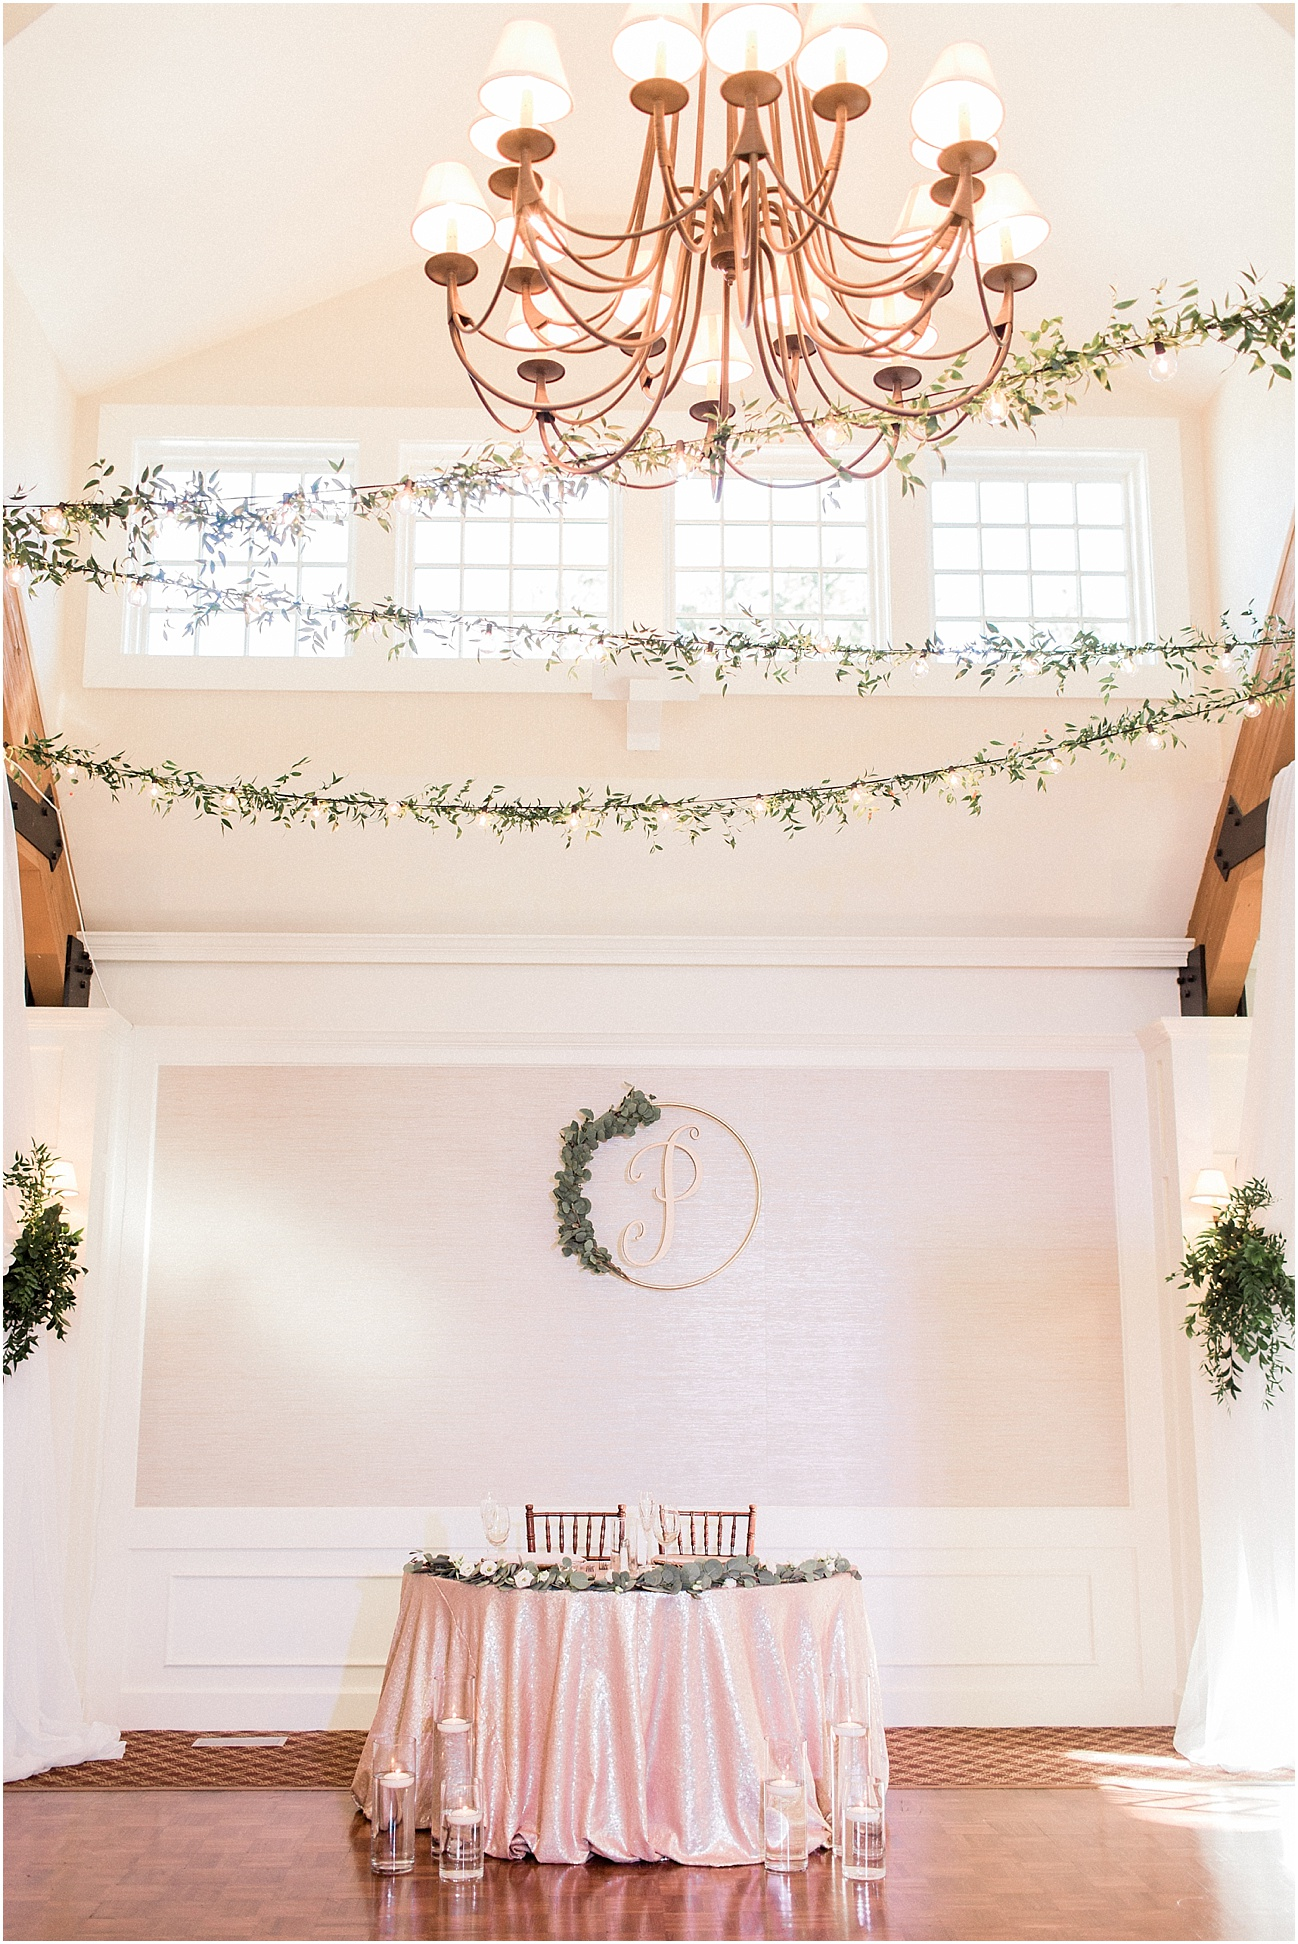 christina_frank_the_pavilion_at_pine_hills_fall_wine_cape_cod_boston_wedding_photographer_meredith_jane_photography_photo_1253.jpg